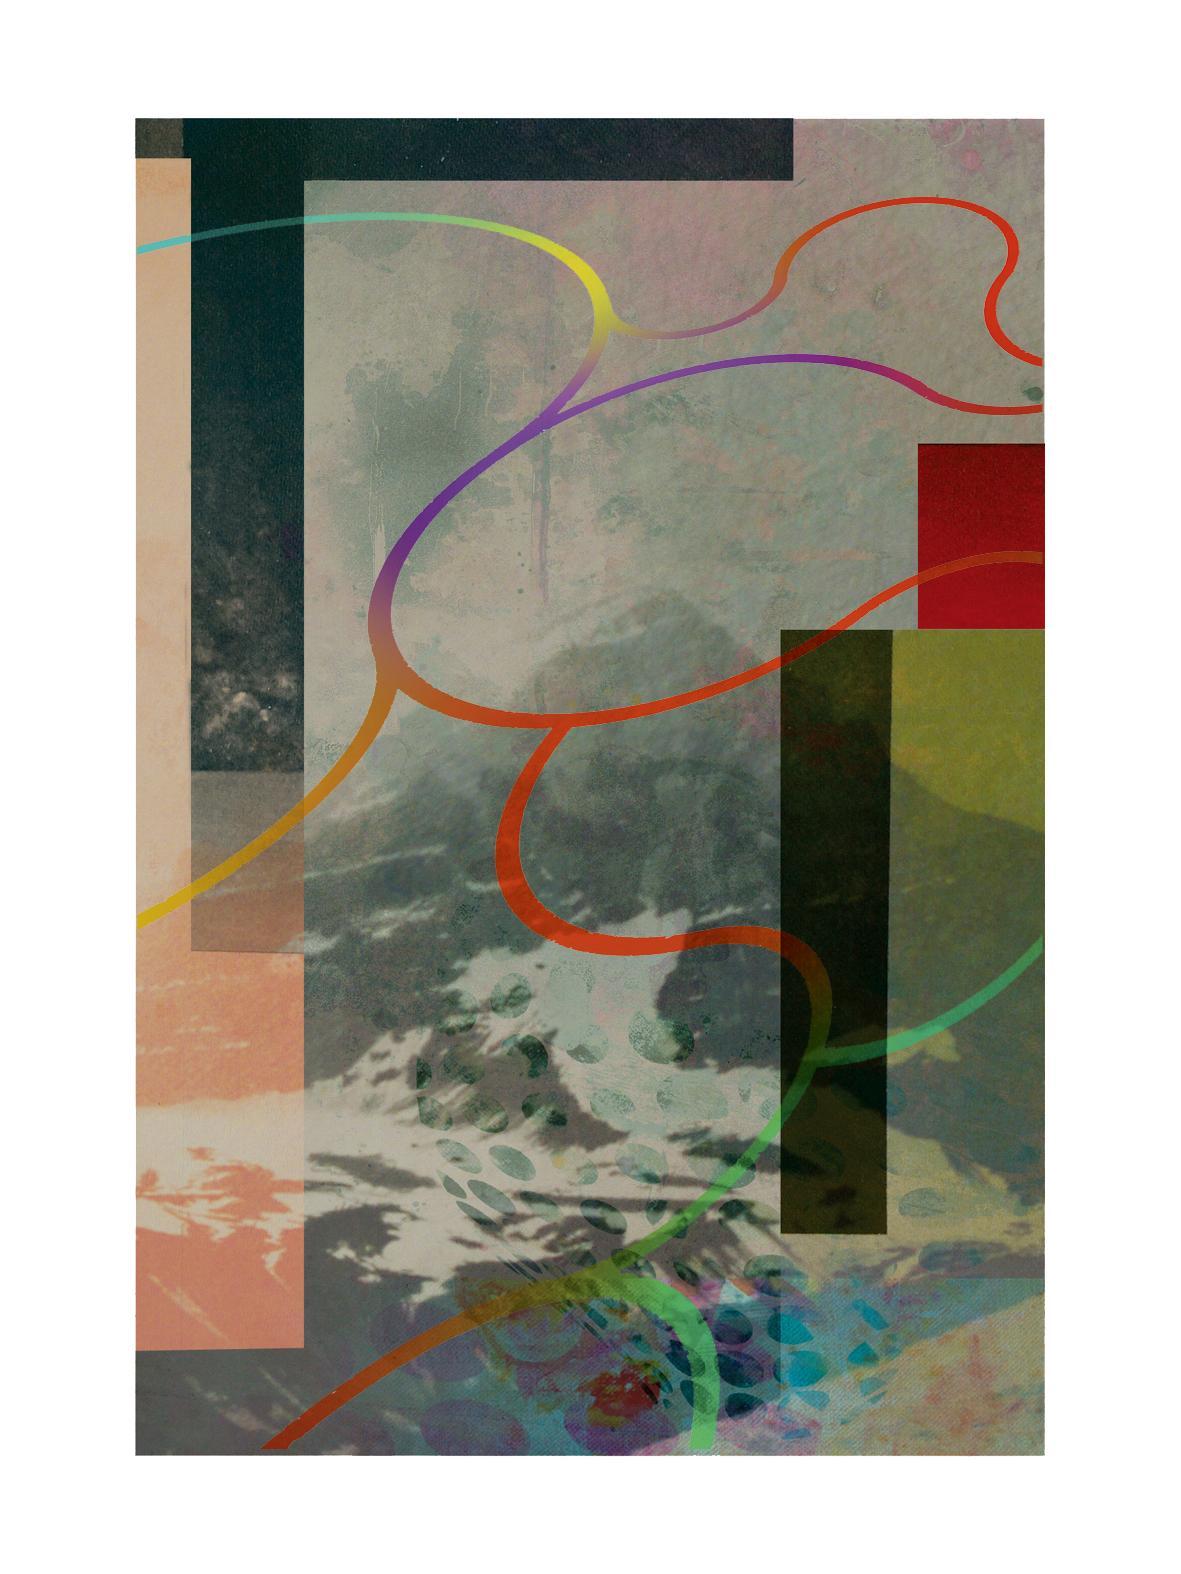 Mountains 002 - Contemporary, Abstract, Modern, Pop art, Surrealist, Landscape